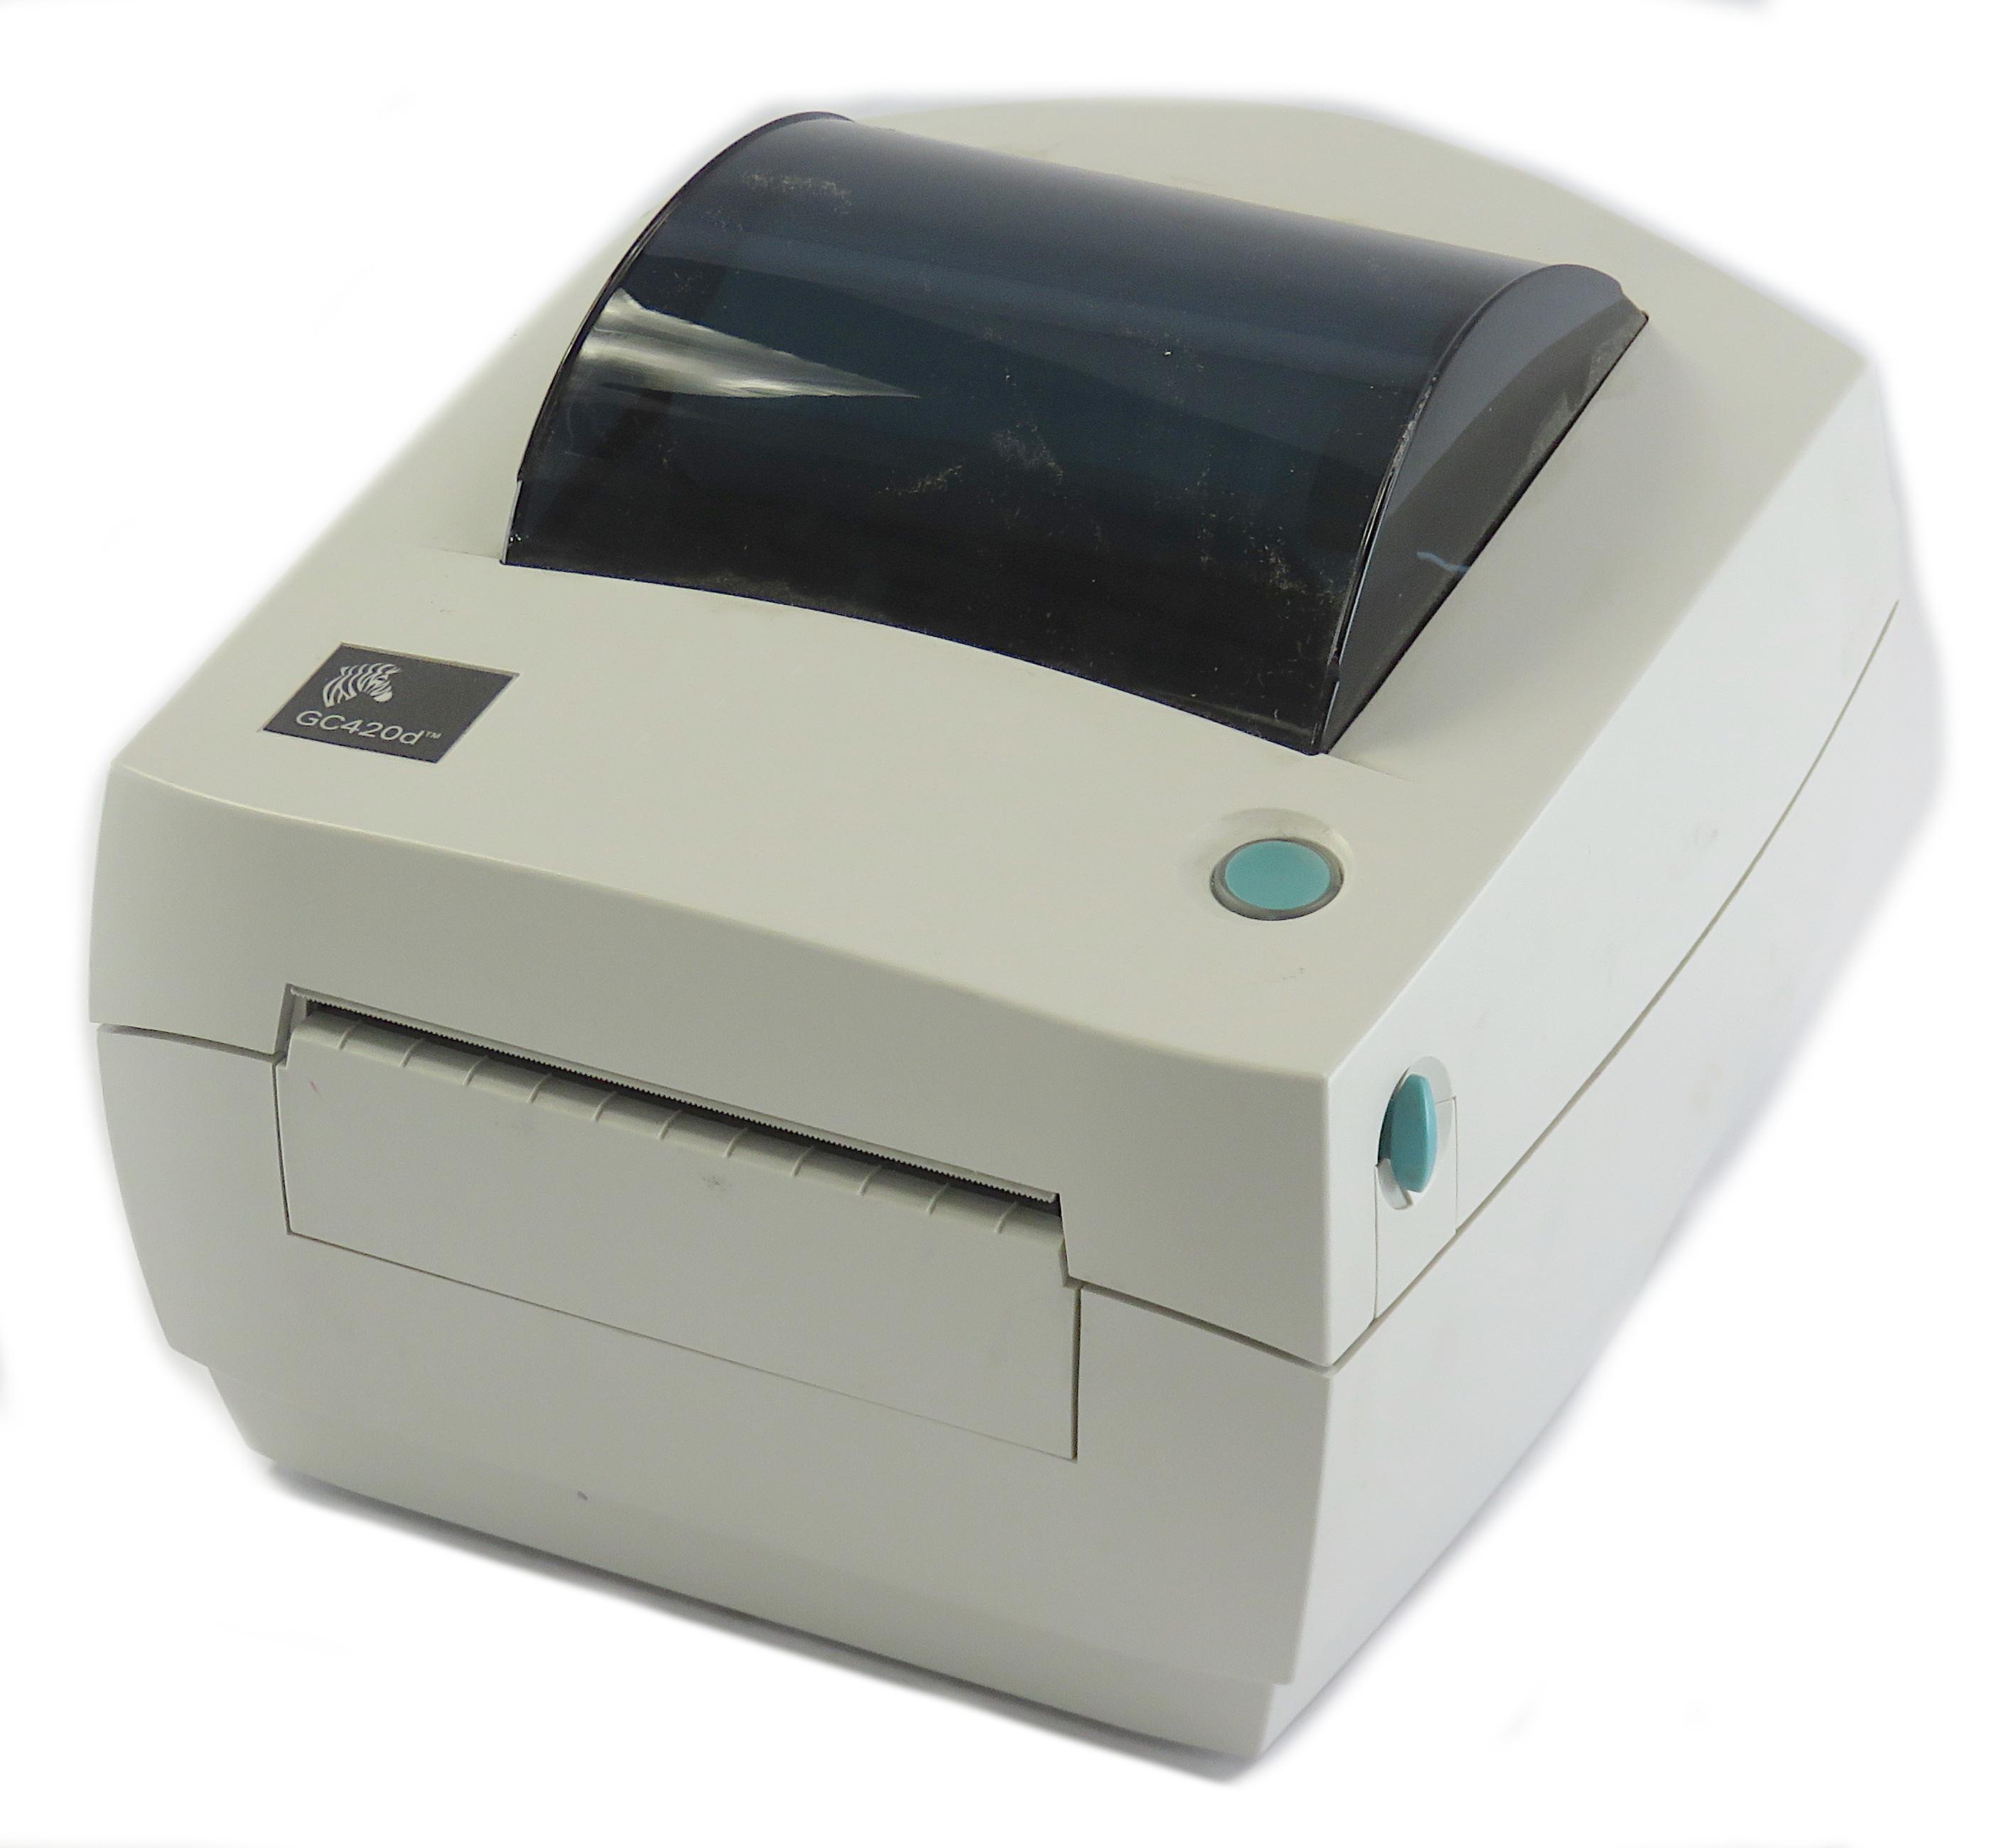 Zebra GC420d Thermal Label Printer GC420-200520-000 USB/Serial/Parallel Interfce